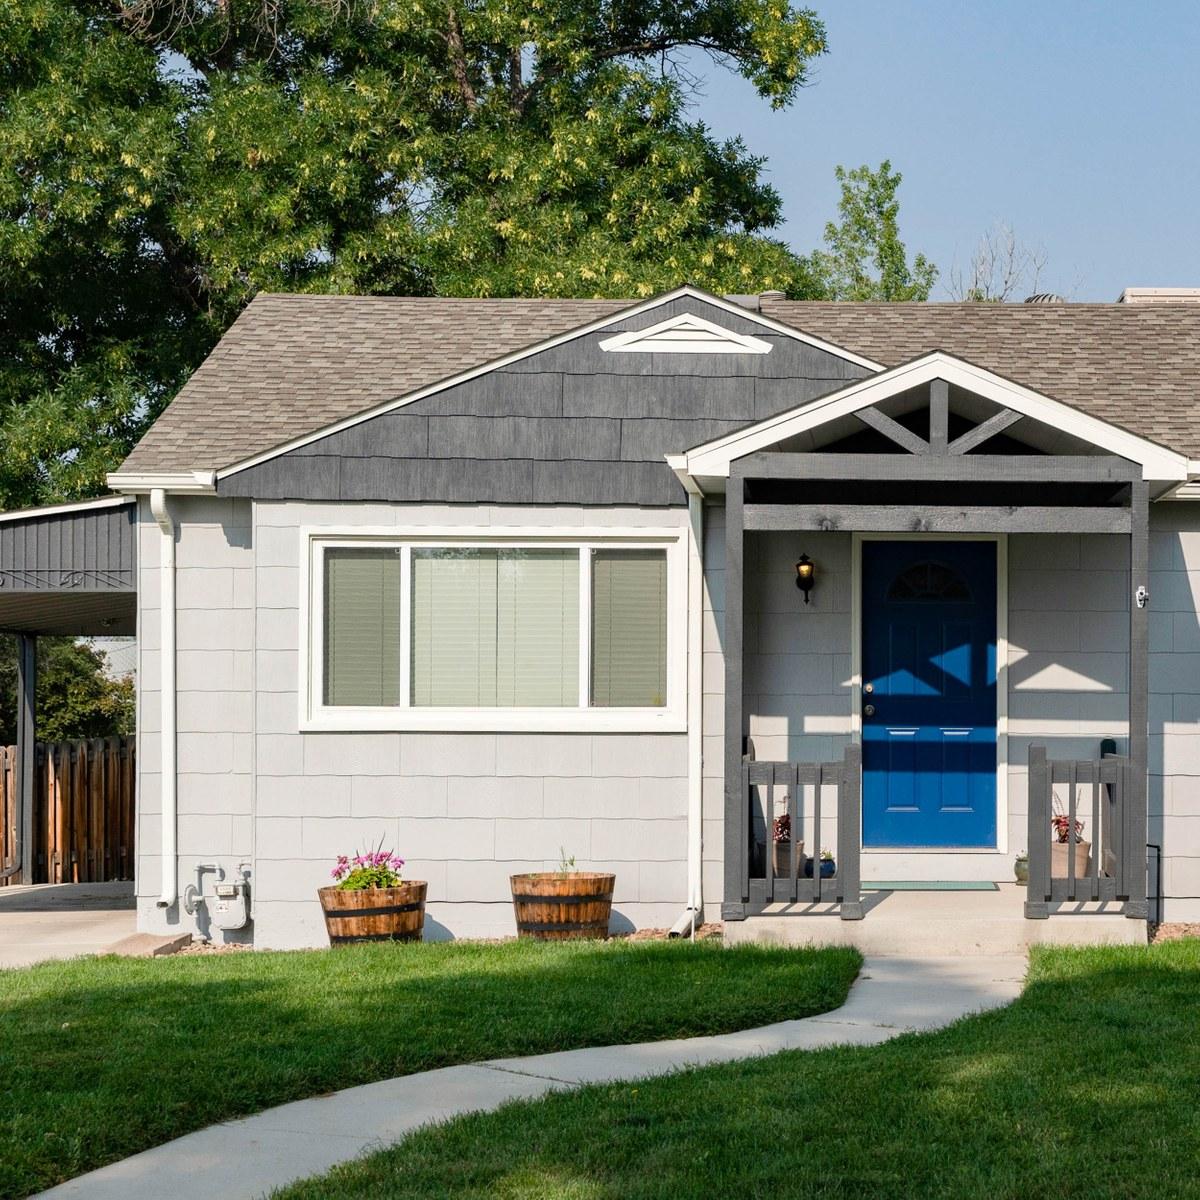 Local Com Homes For Rent: Jason Park, Englewood CO - Neighborhood Guide